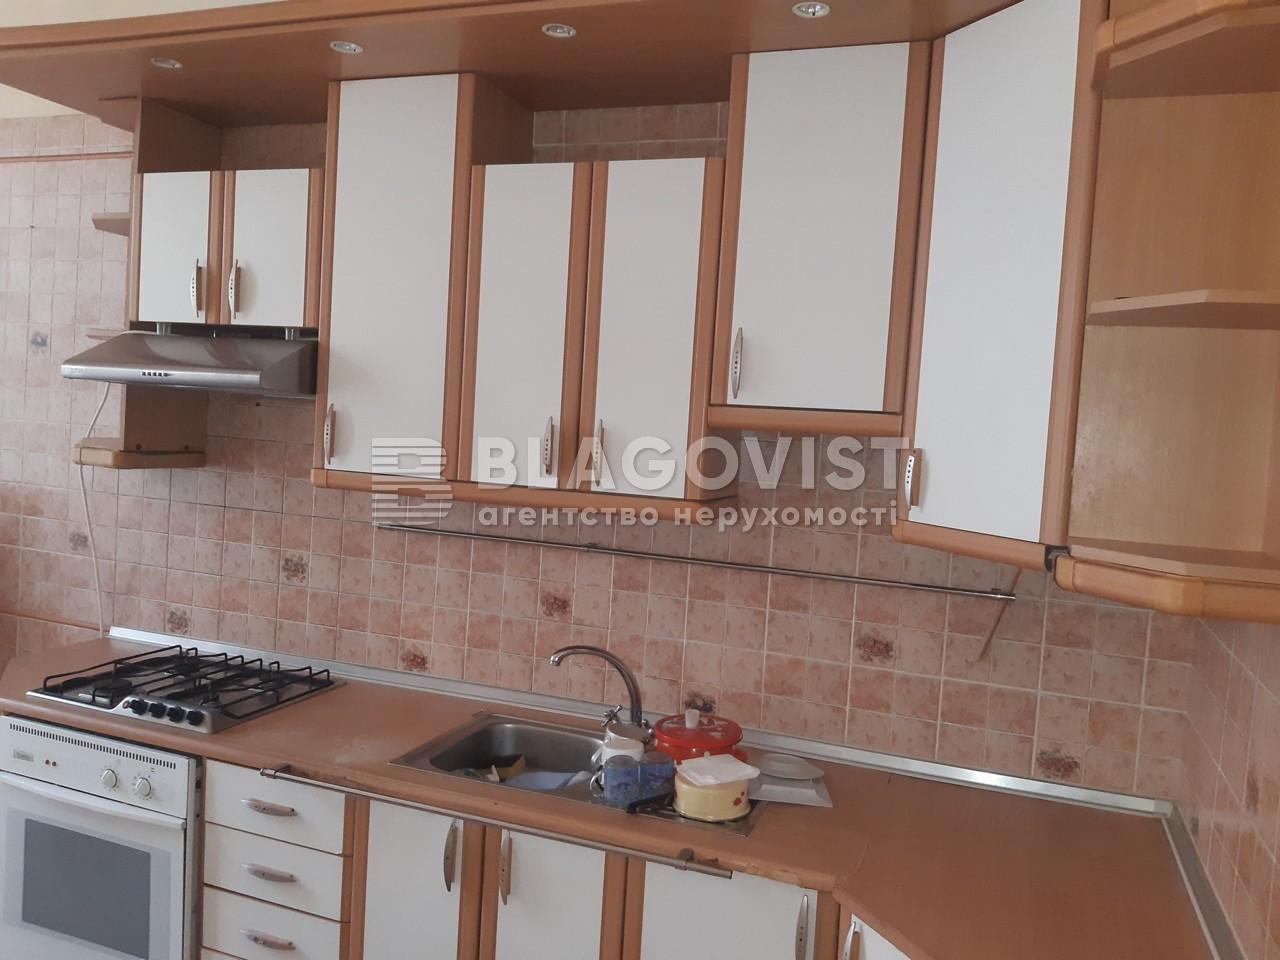 Квартира R-40017, Саксаганского, 36, Киев - Фото 10